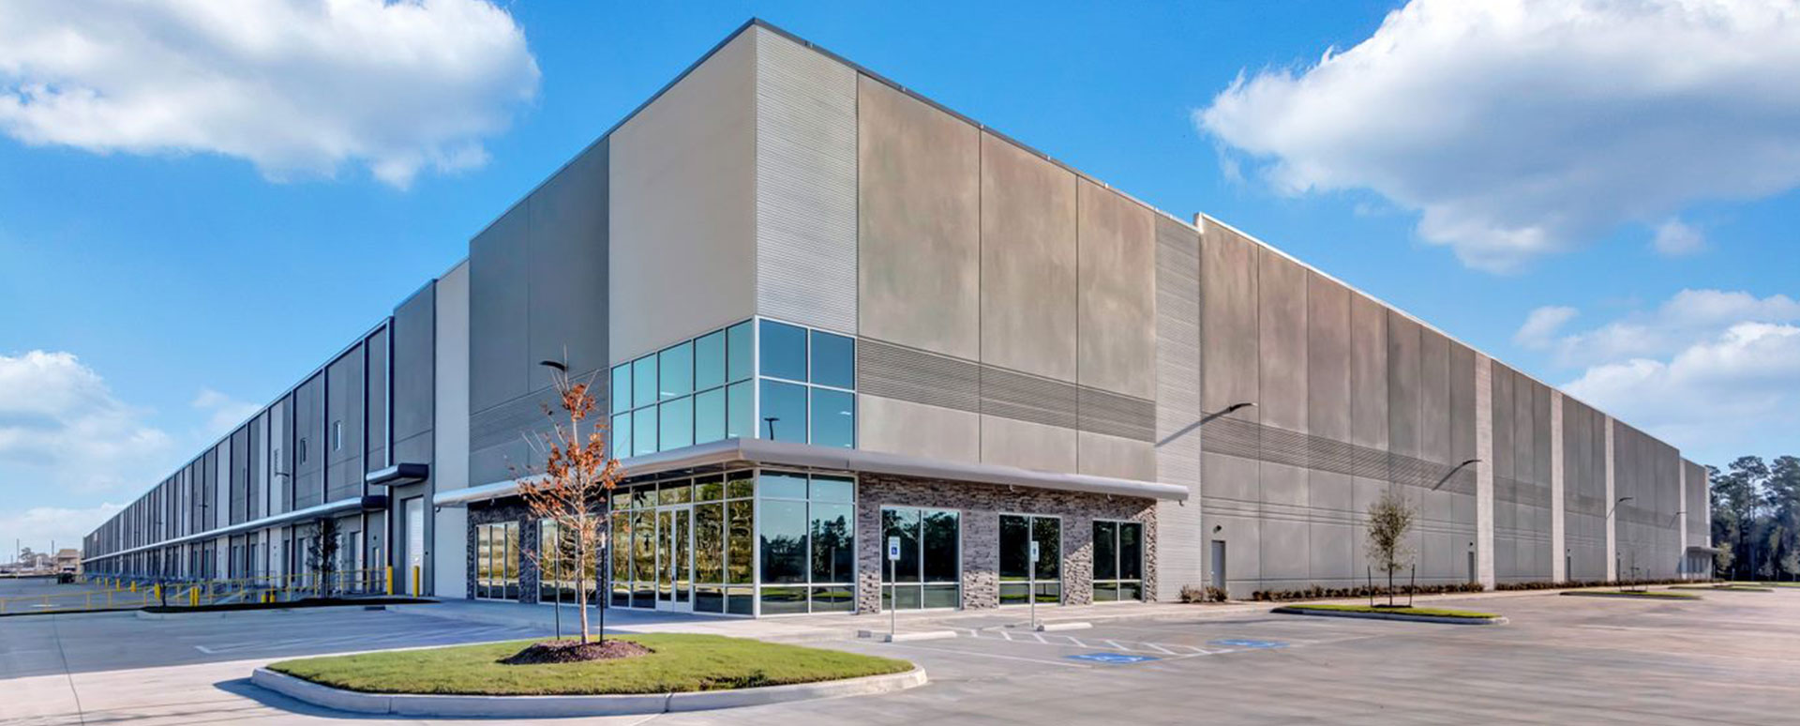 Air 59 Logistics Center - Humble, TX 1